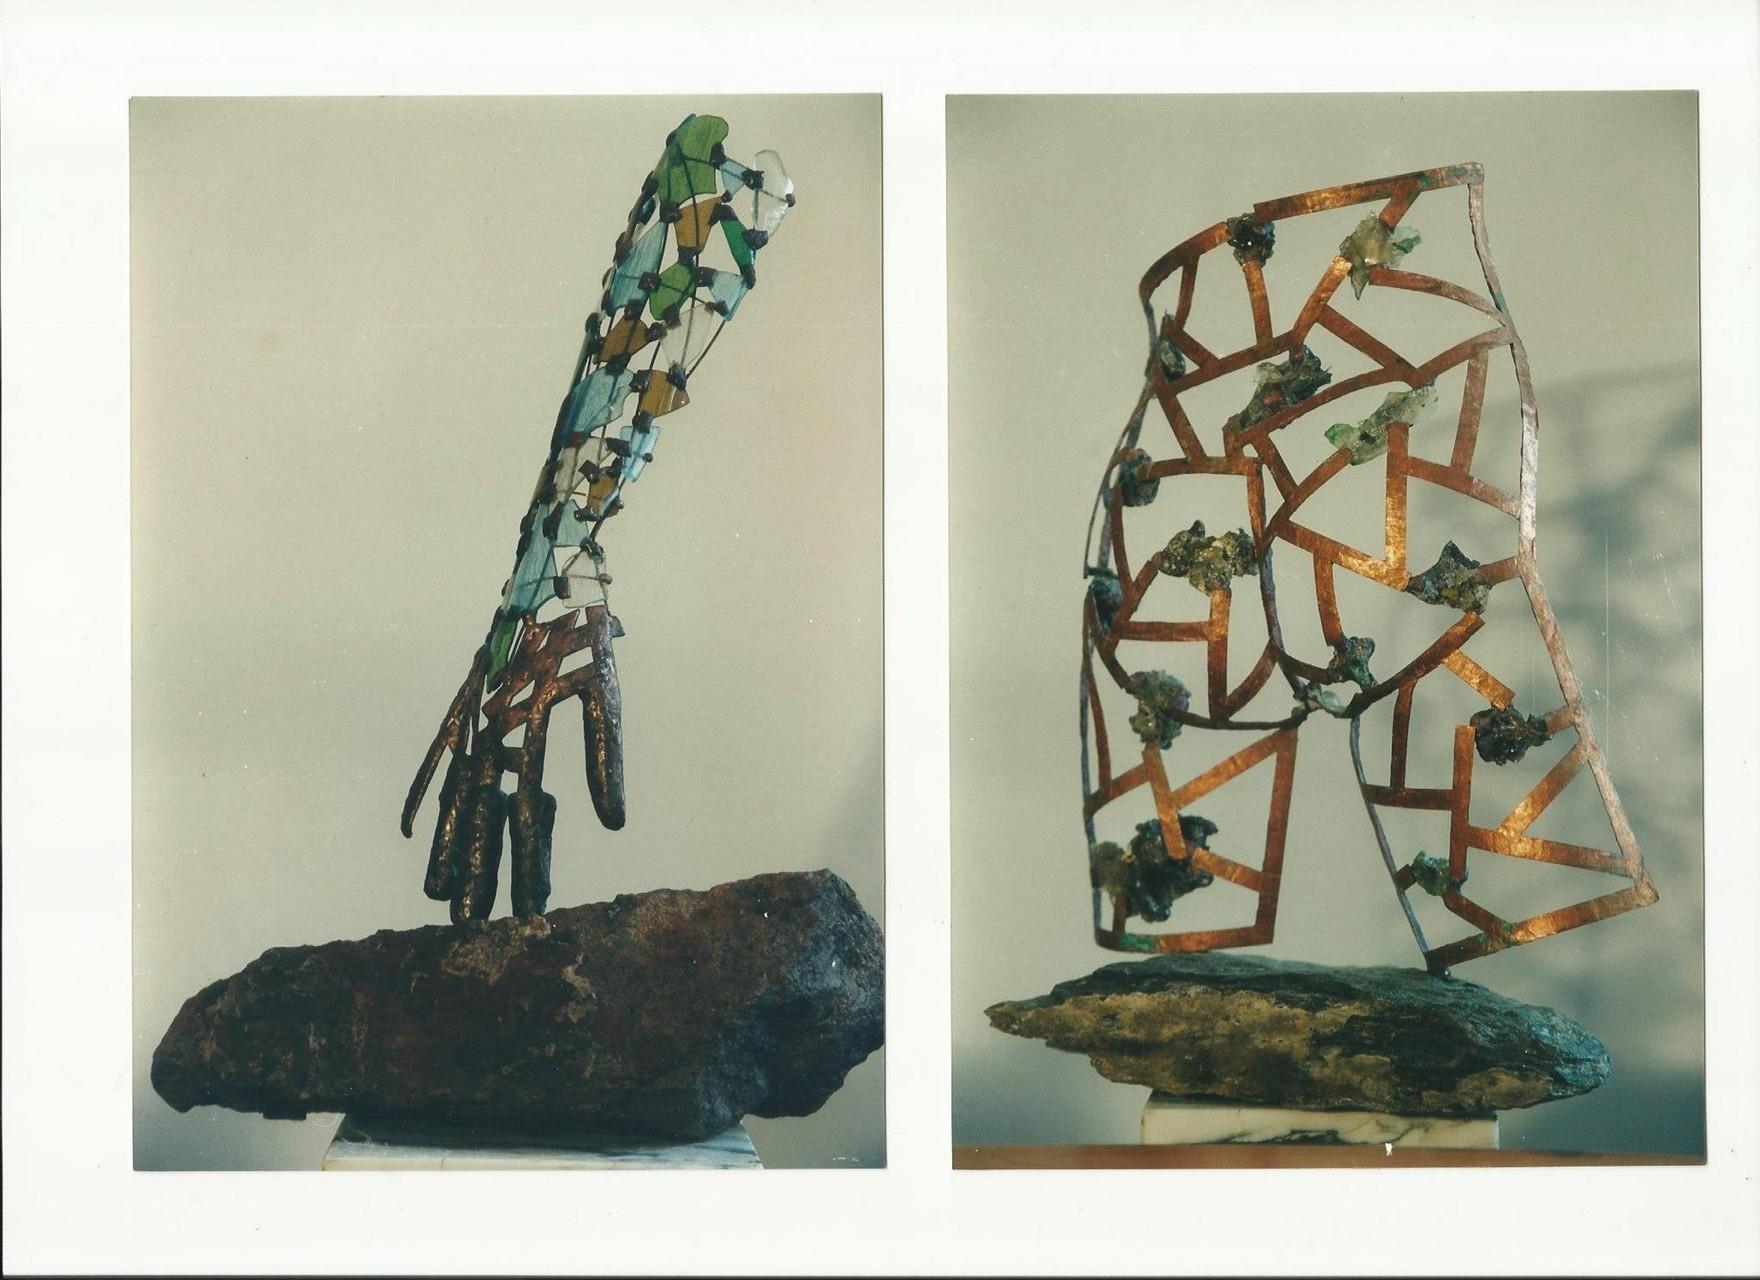 Atelierarbeiten, Cabo de Gata - Andalusien, 1998 - 2006